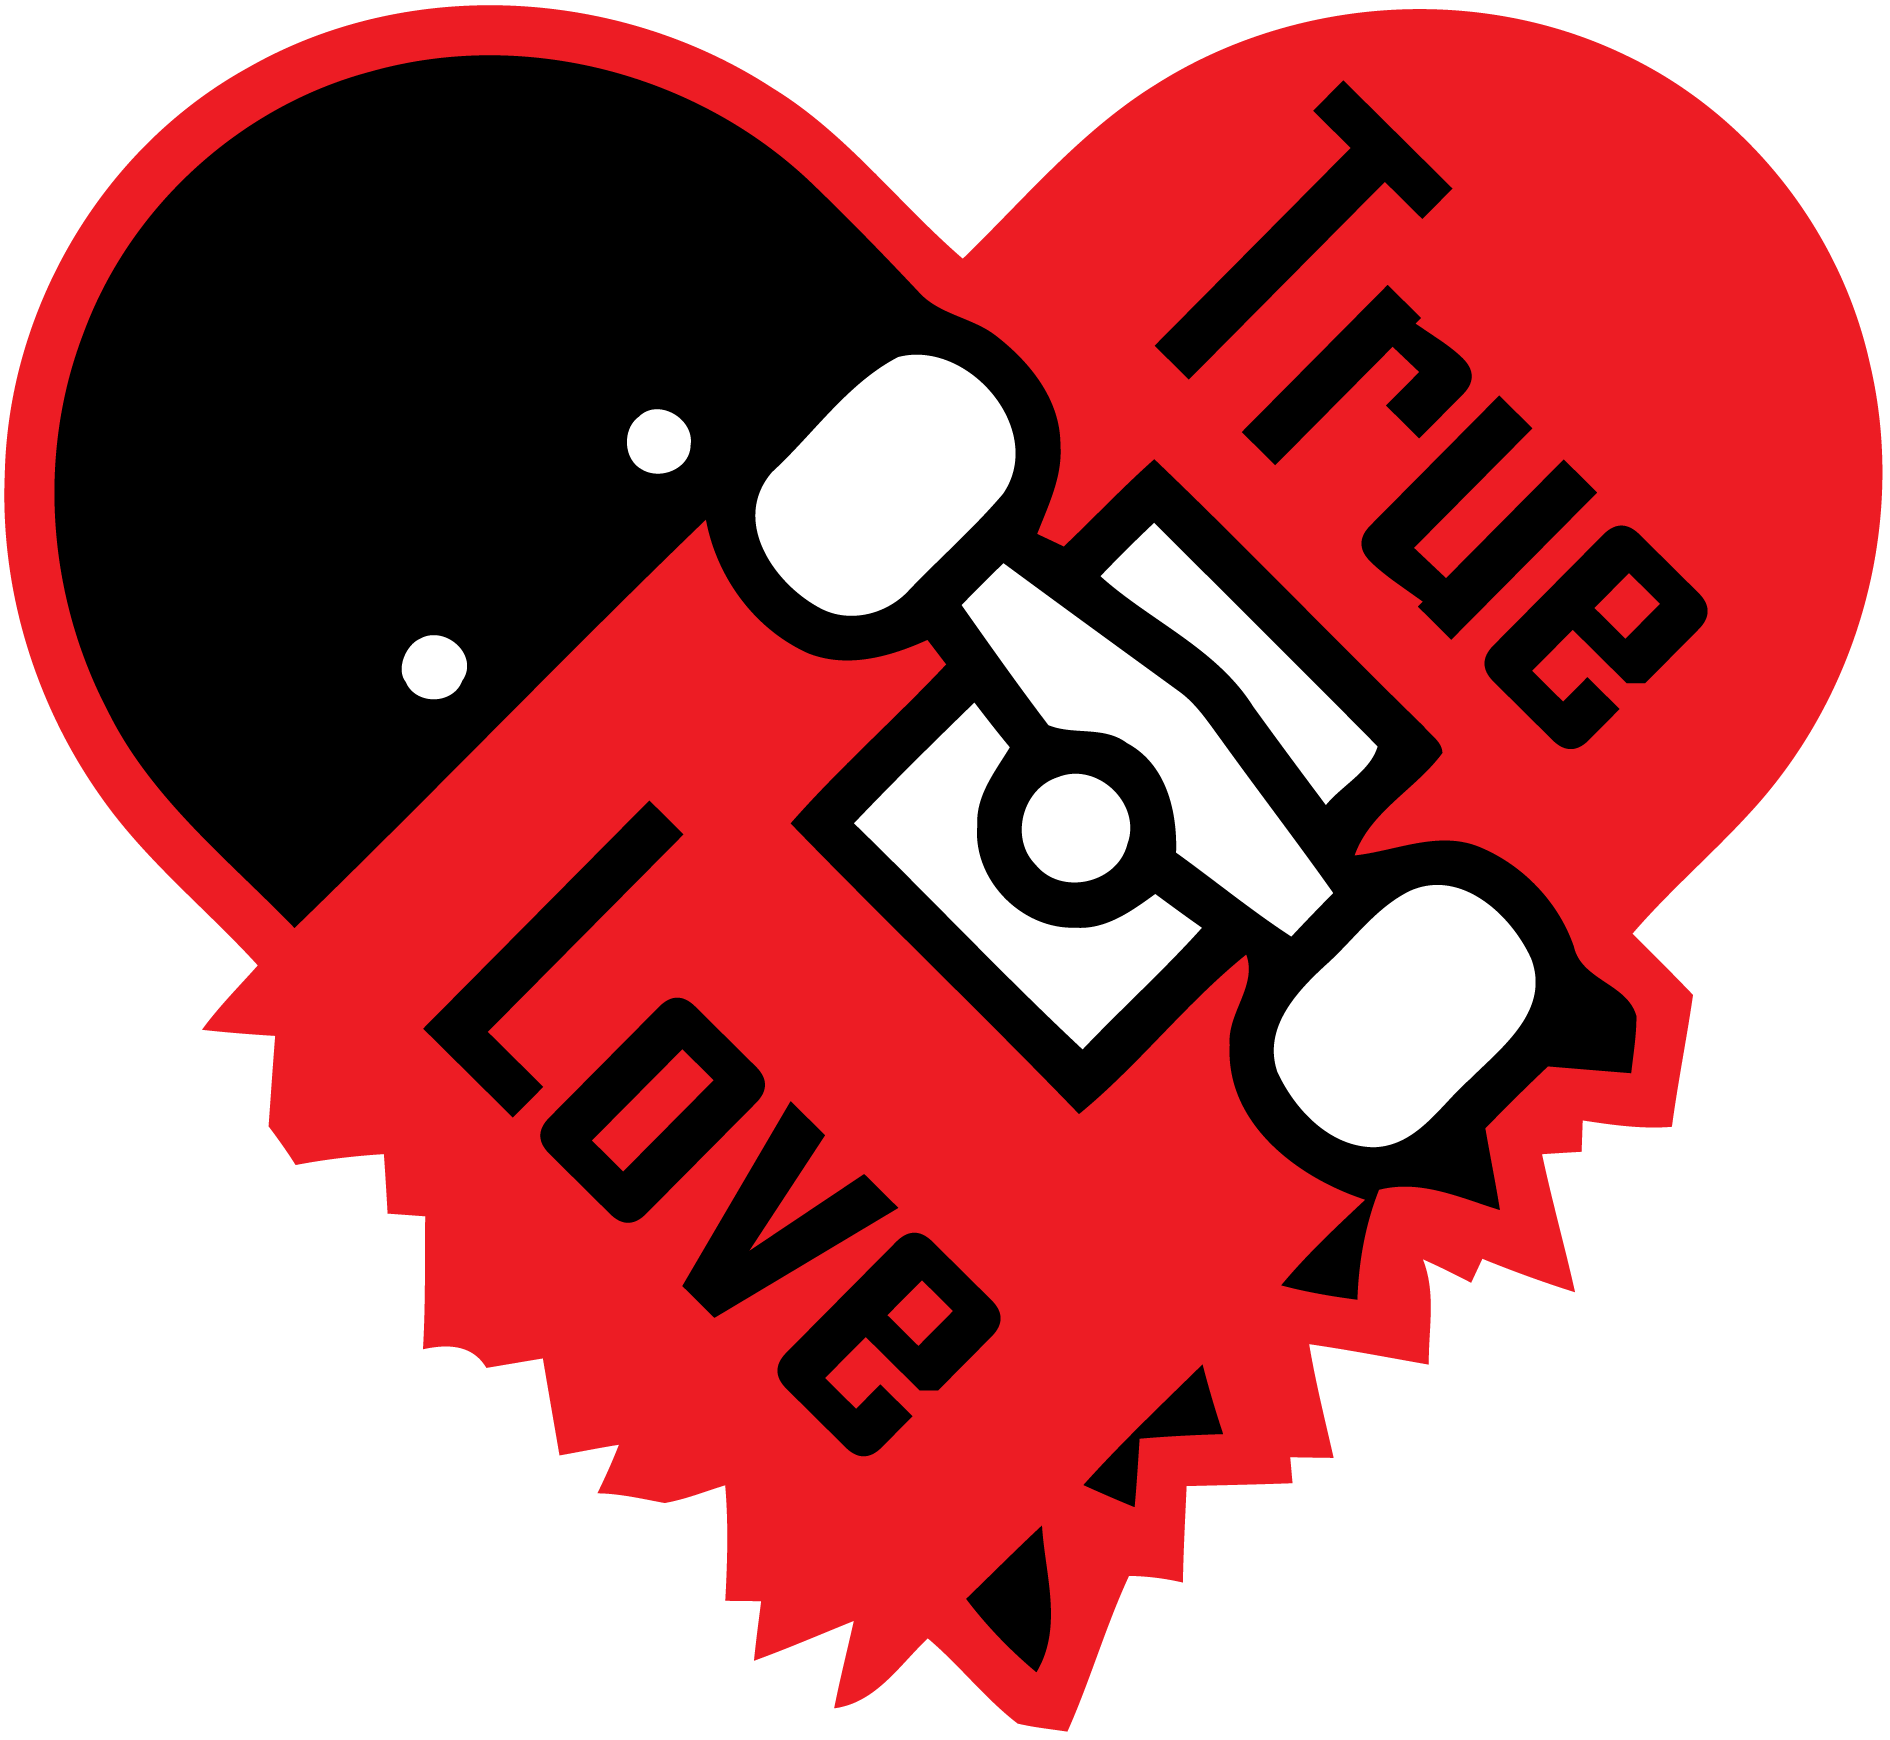 True Love Sk8 by ghostgrafix on DeviantArt